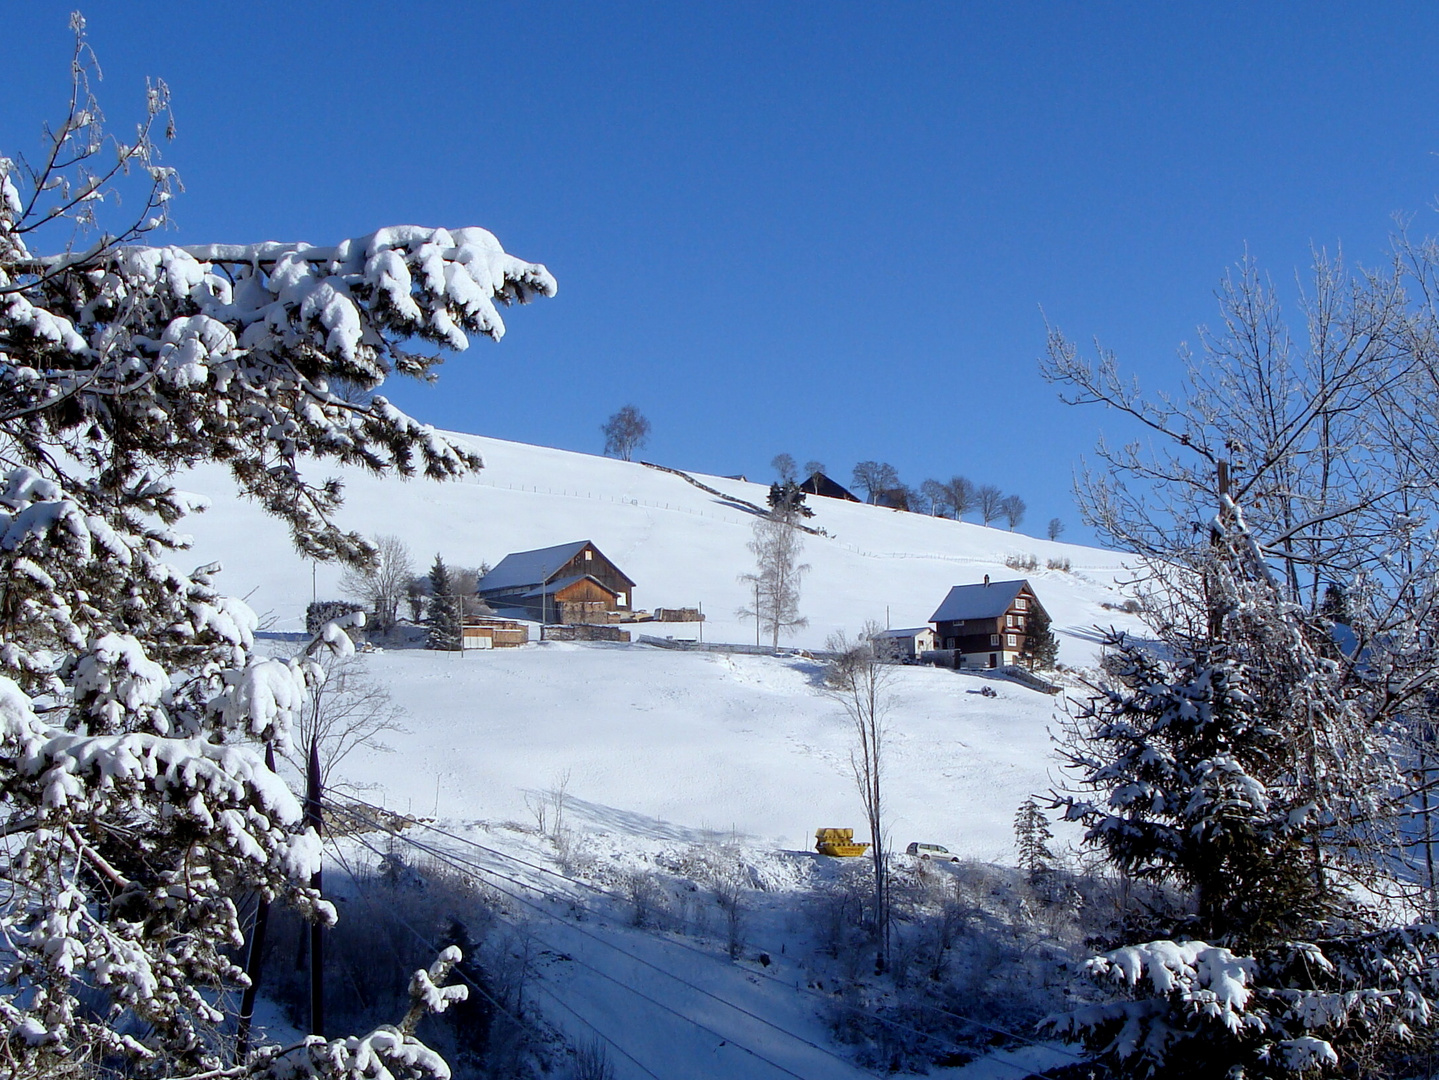 Neige et ciel bleu.001